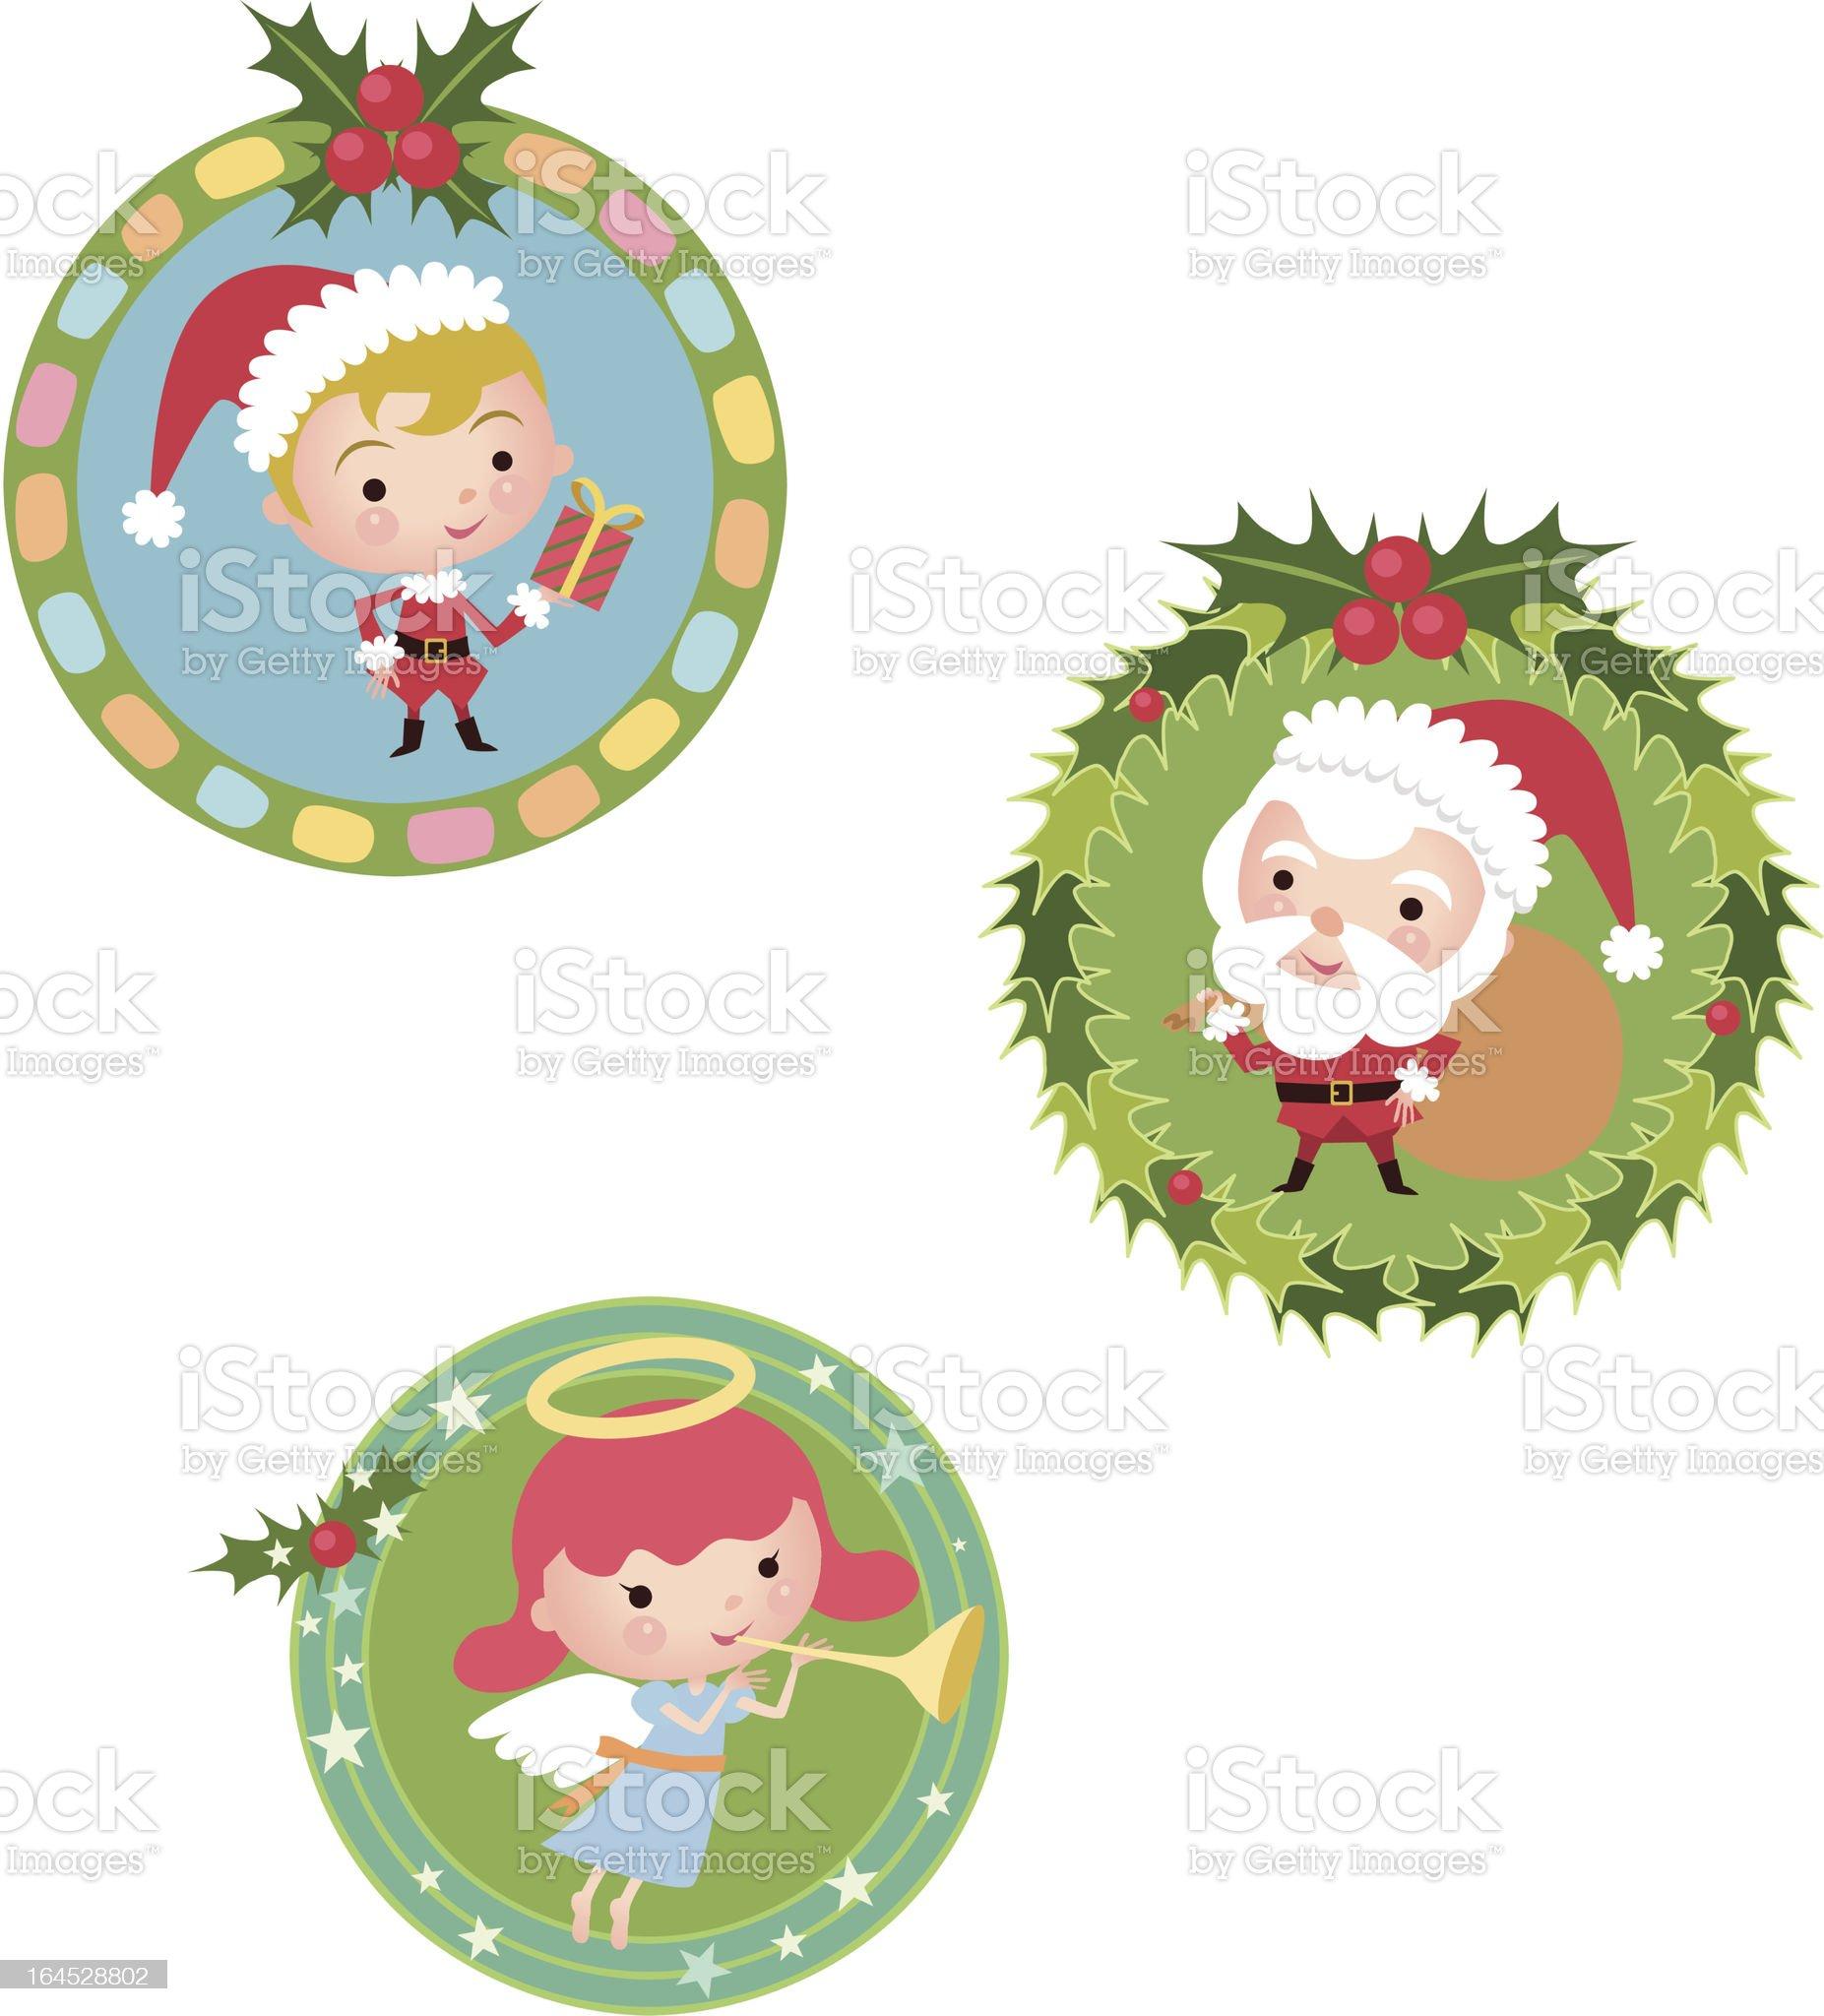 Santa Claus-Christmas wreath royalty-free stock vector art